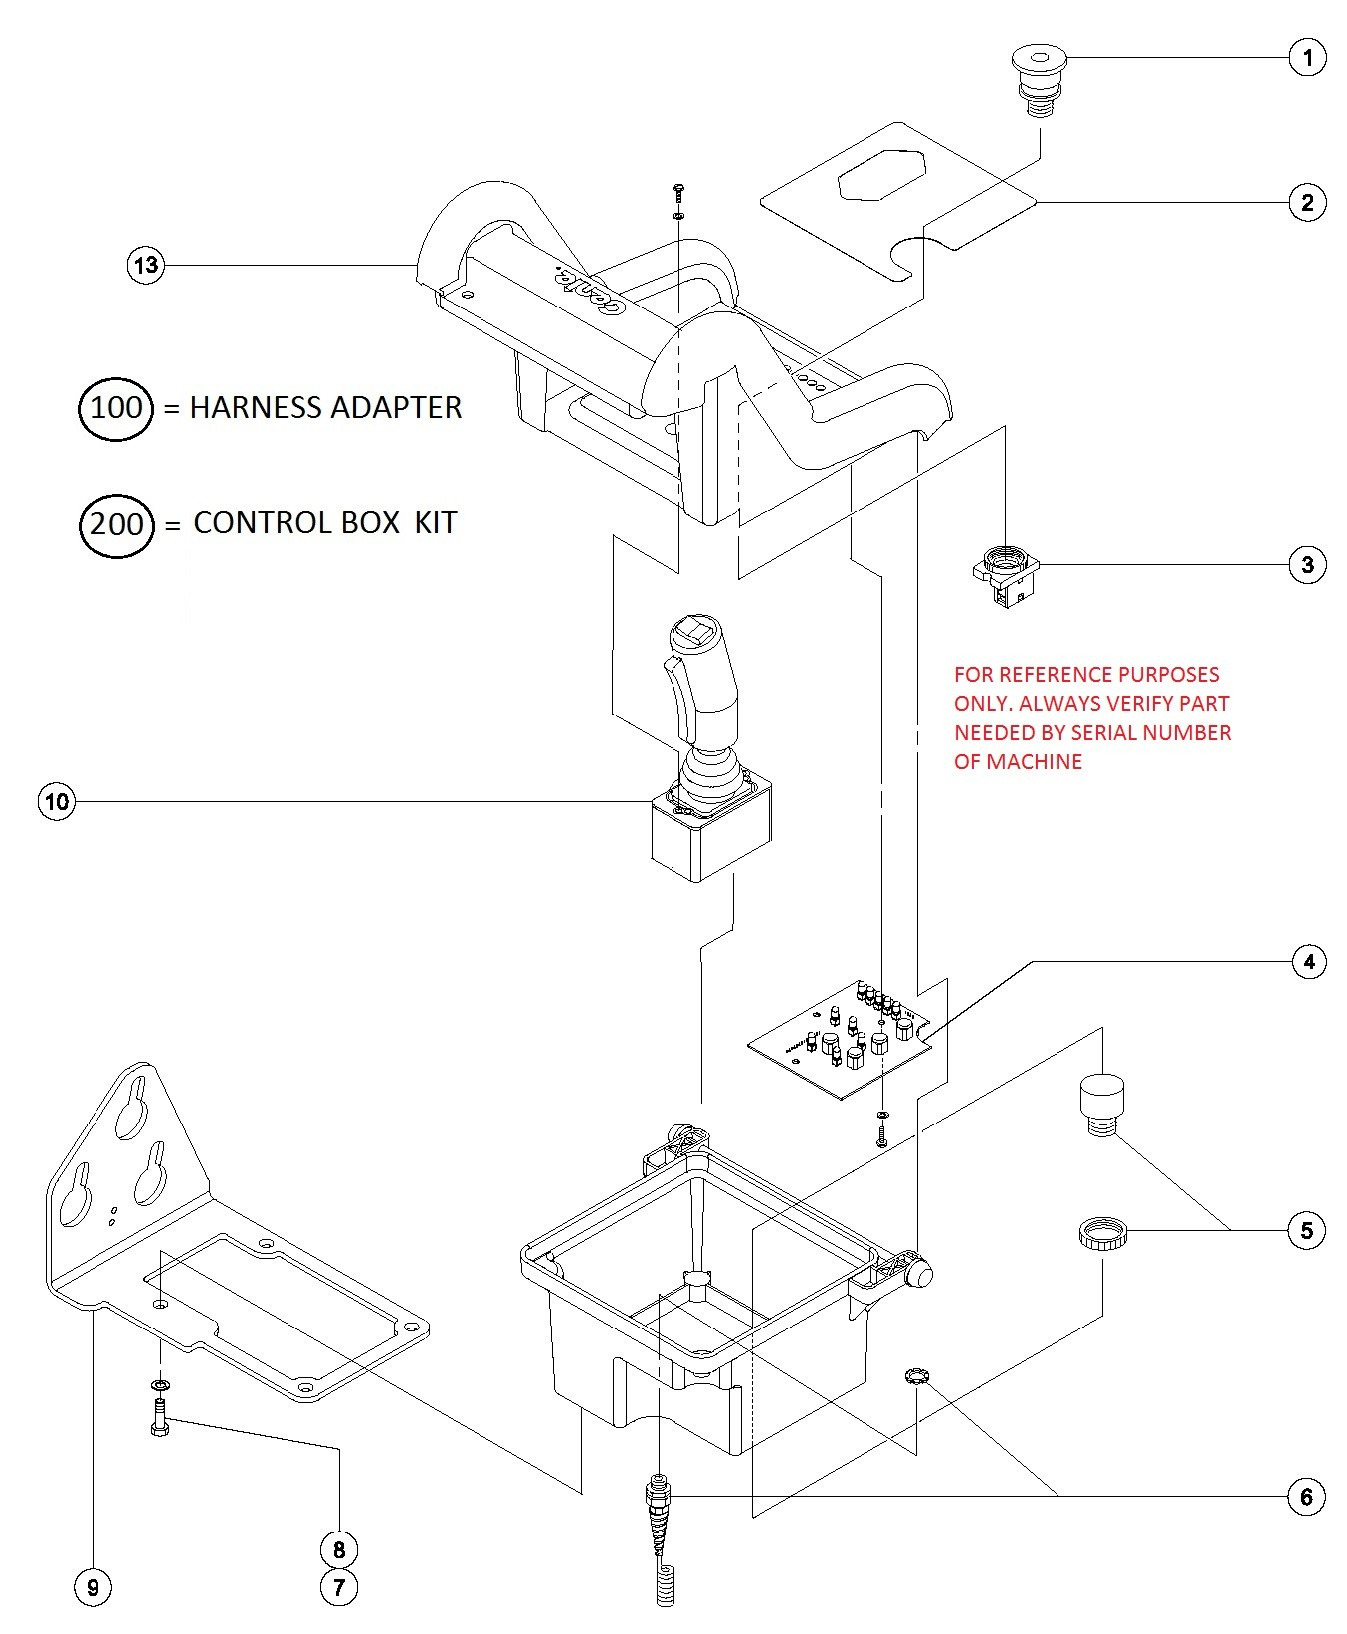 Upright Scissor Lift Wiring Diagram Grove Manlift Wiring Diagrams Manitou Diagram Upright Scissor Lift Of Upright Scissor Lift Wiring Diagram